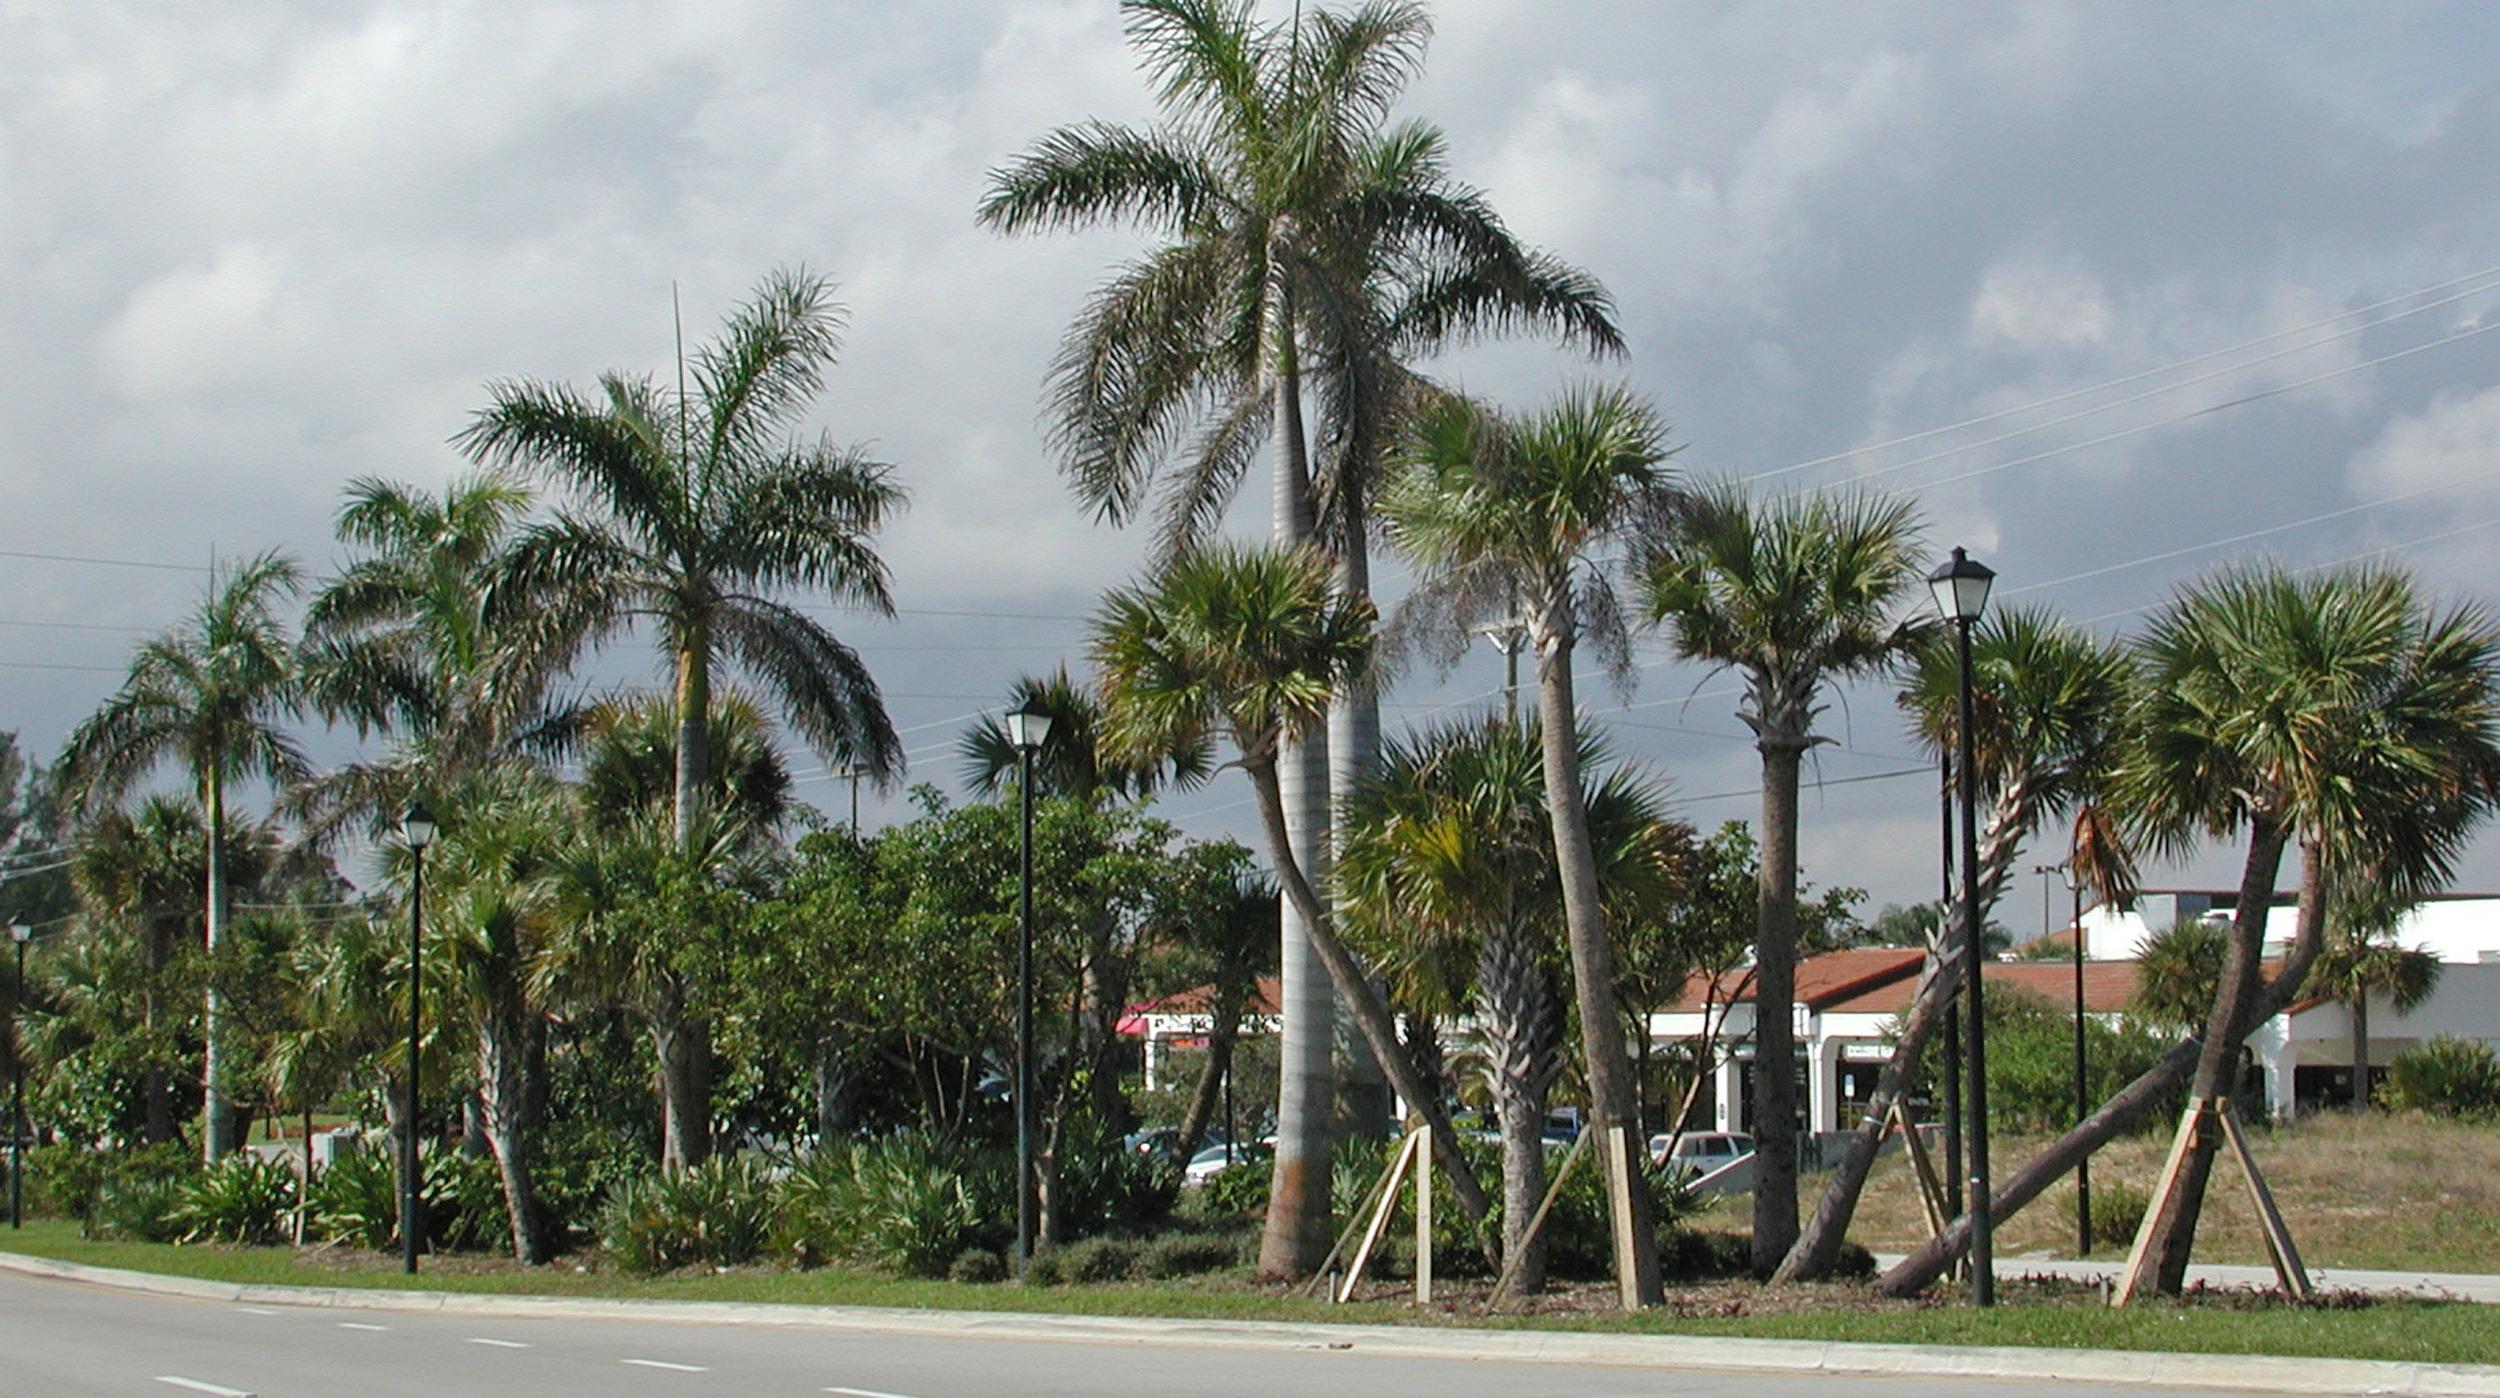 Donald Ross Road Palm Beach County Florida Landscape Roadway.jpg